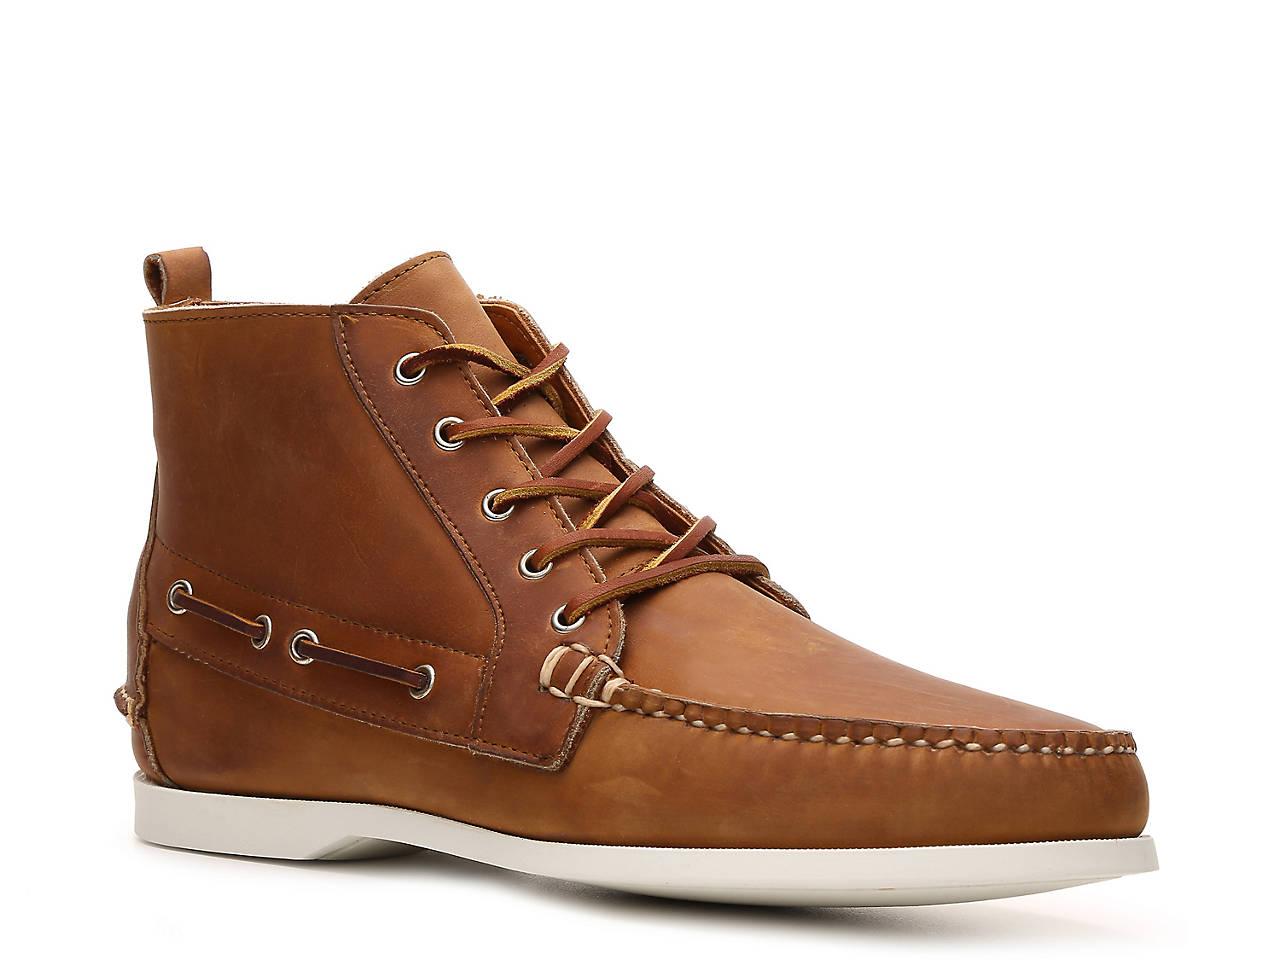 6dd1e906 Telford Leather Chukka Boot